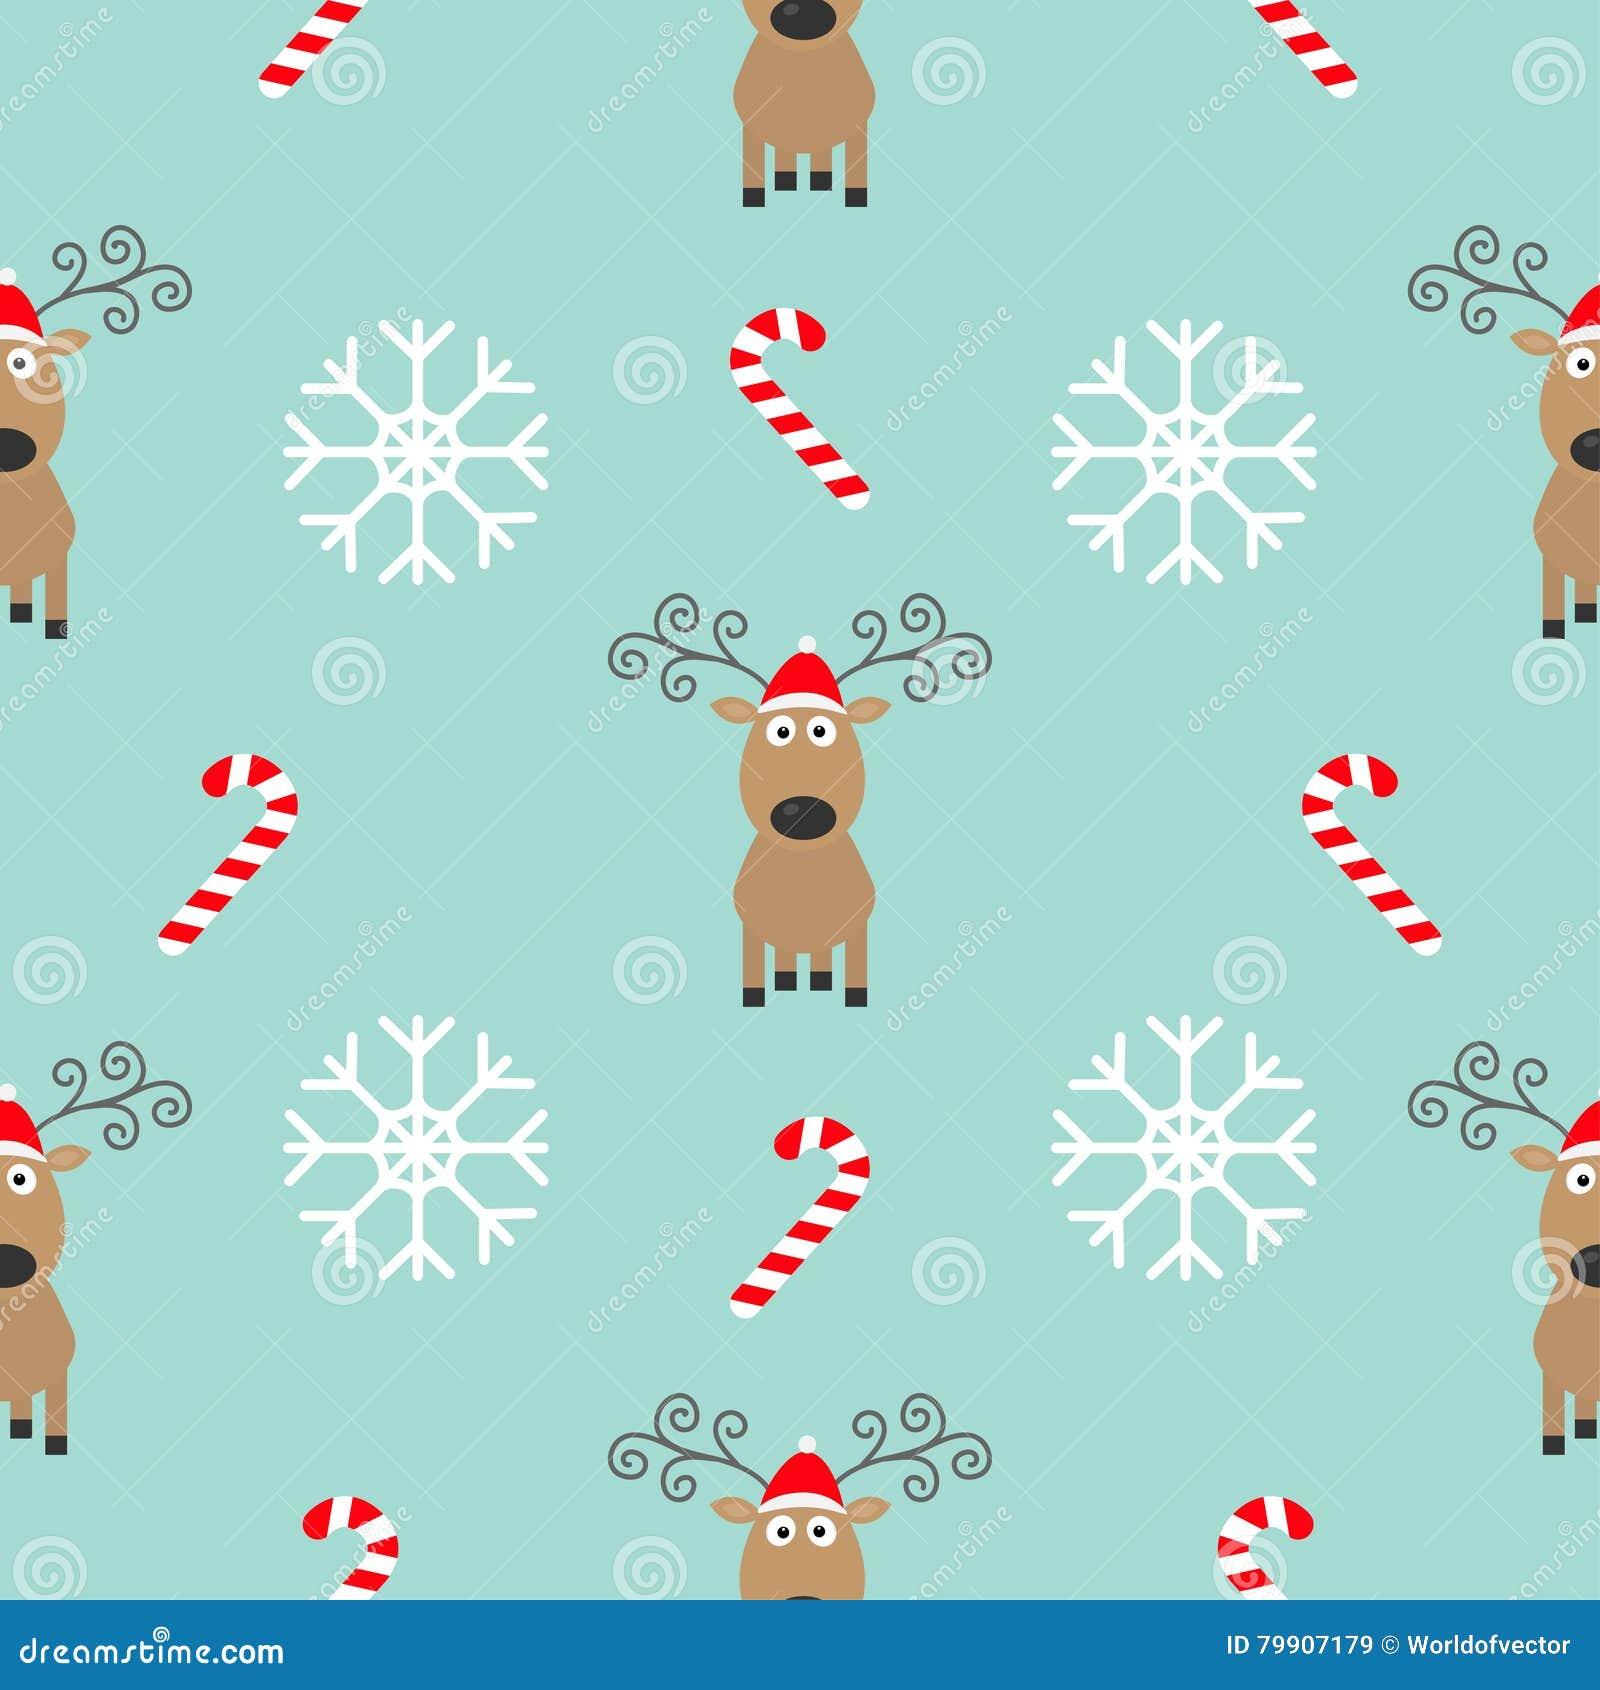 Christmas Snowflake Candy Cane, Deer Wearing Red Santa Hat. Seamless ...